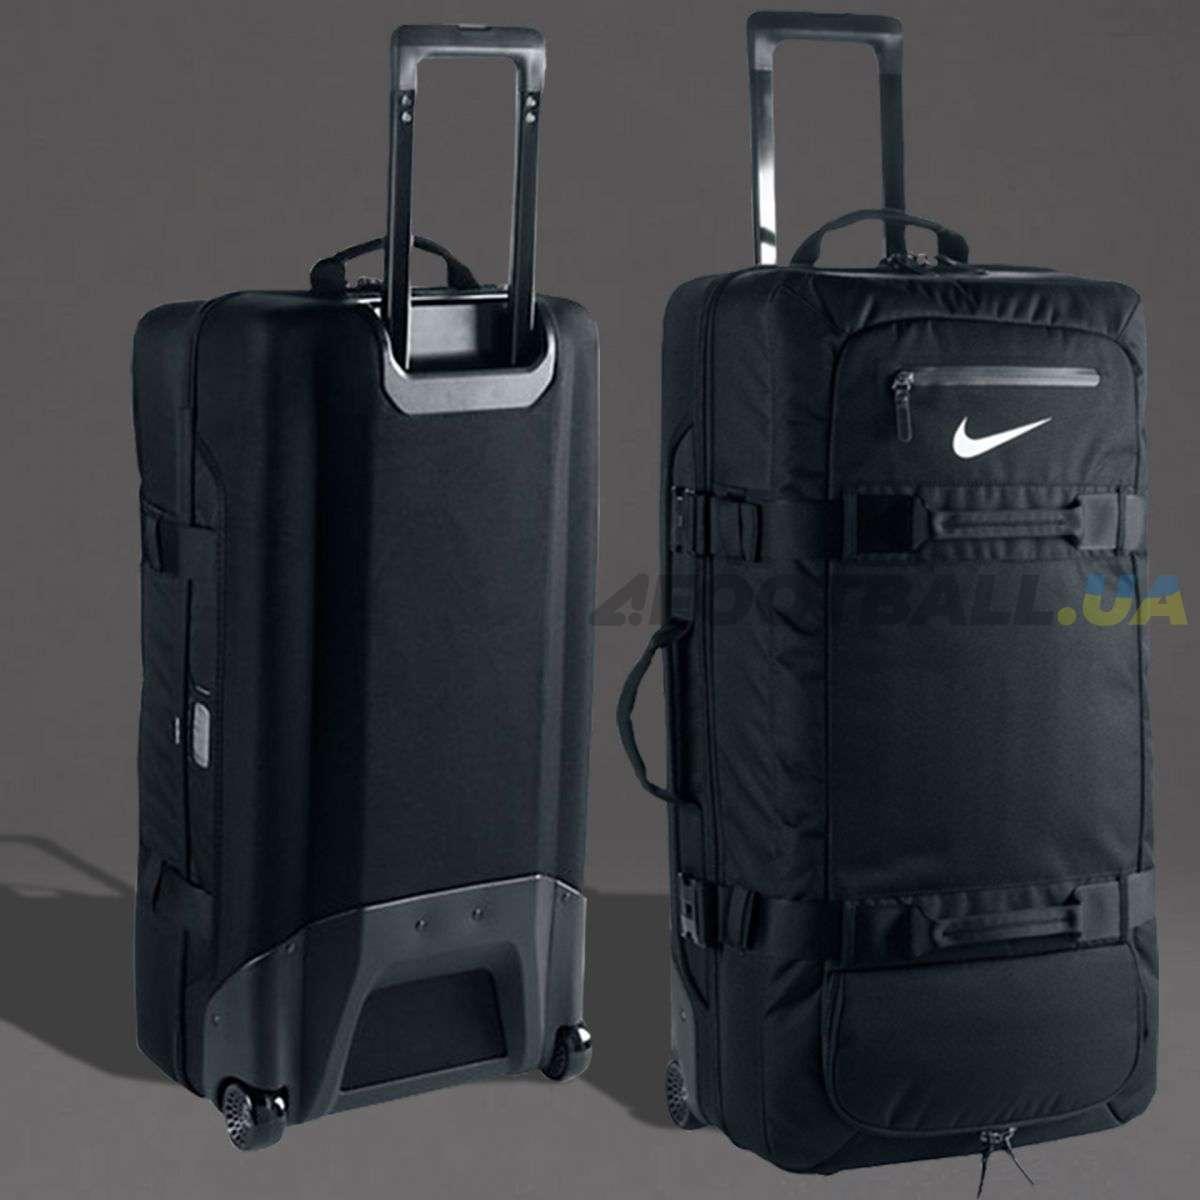 9d4908f2774a СУМКА / ЧЕМОДАН НА КОЛЁСАХ XL Nike FiftyOne49 Cabin Roller PBZ278-001 ...